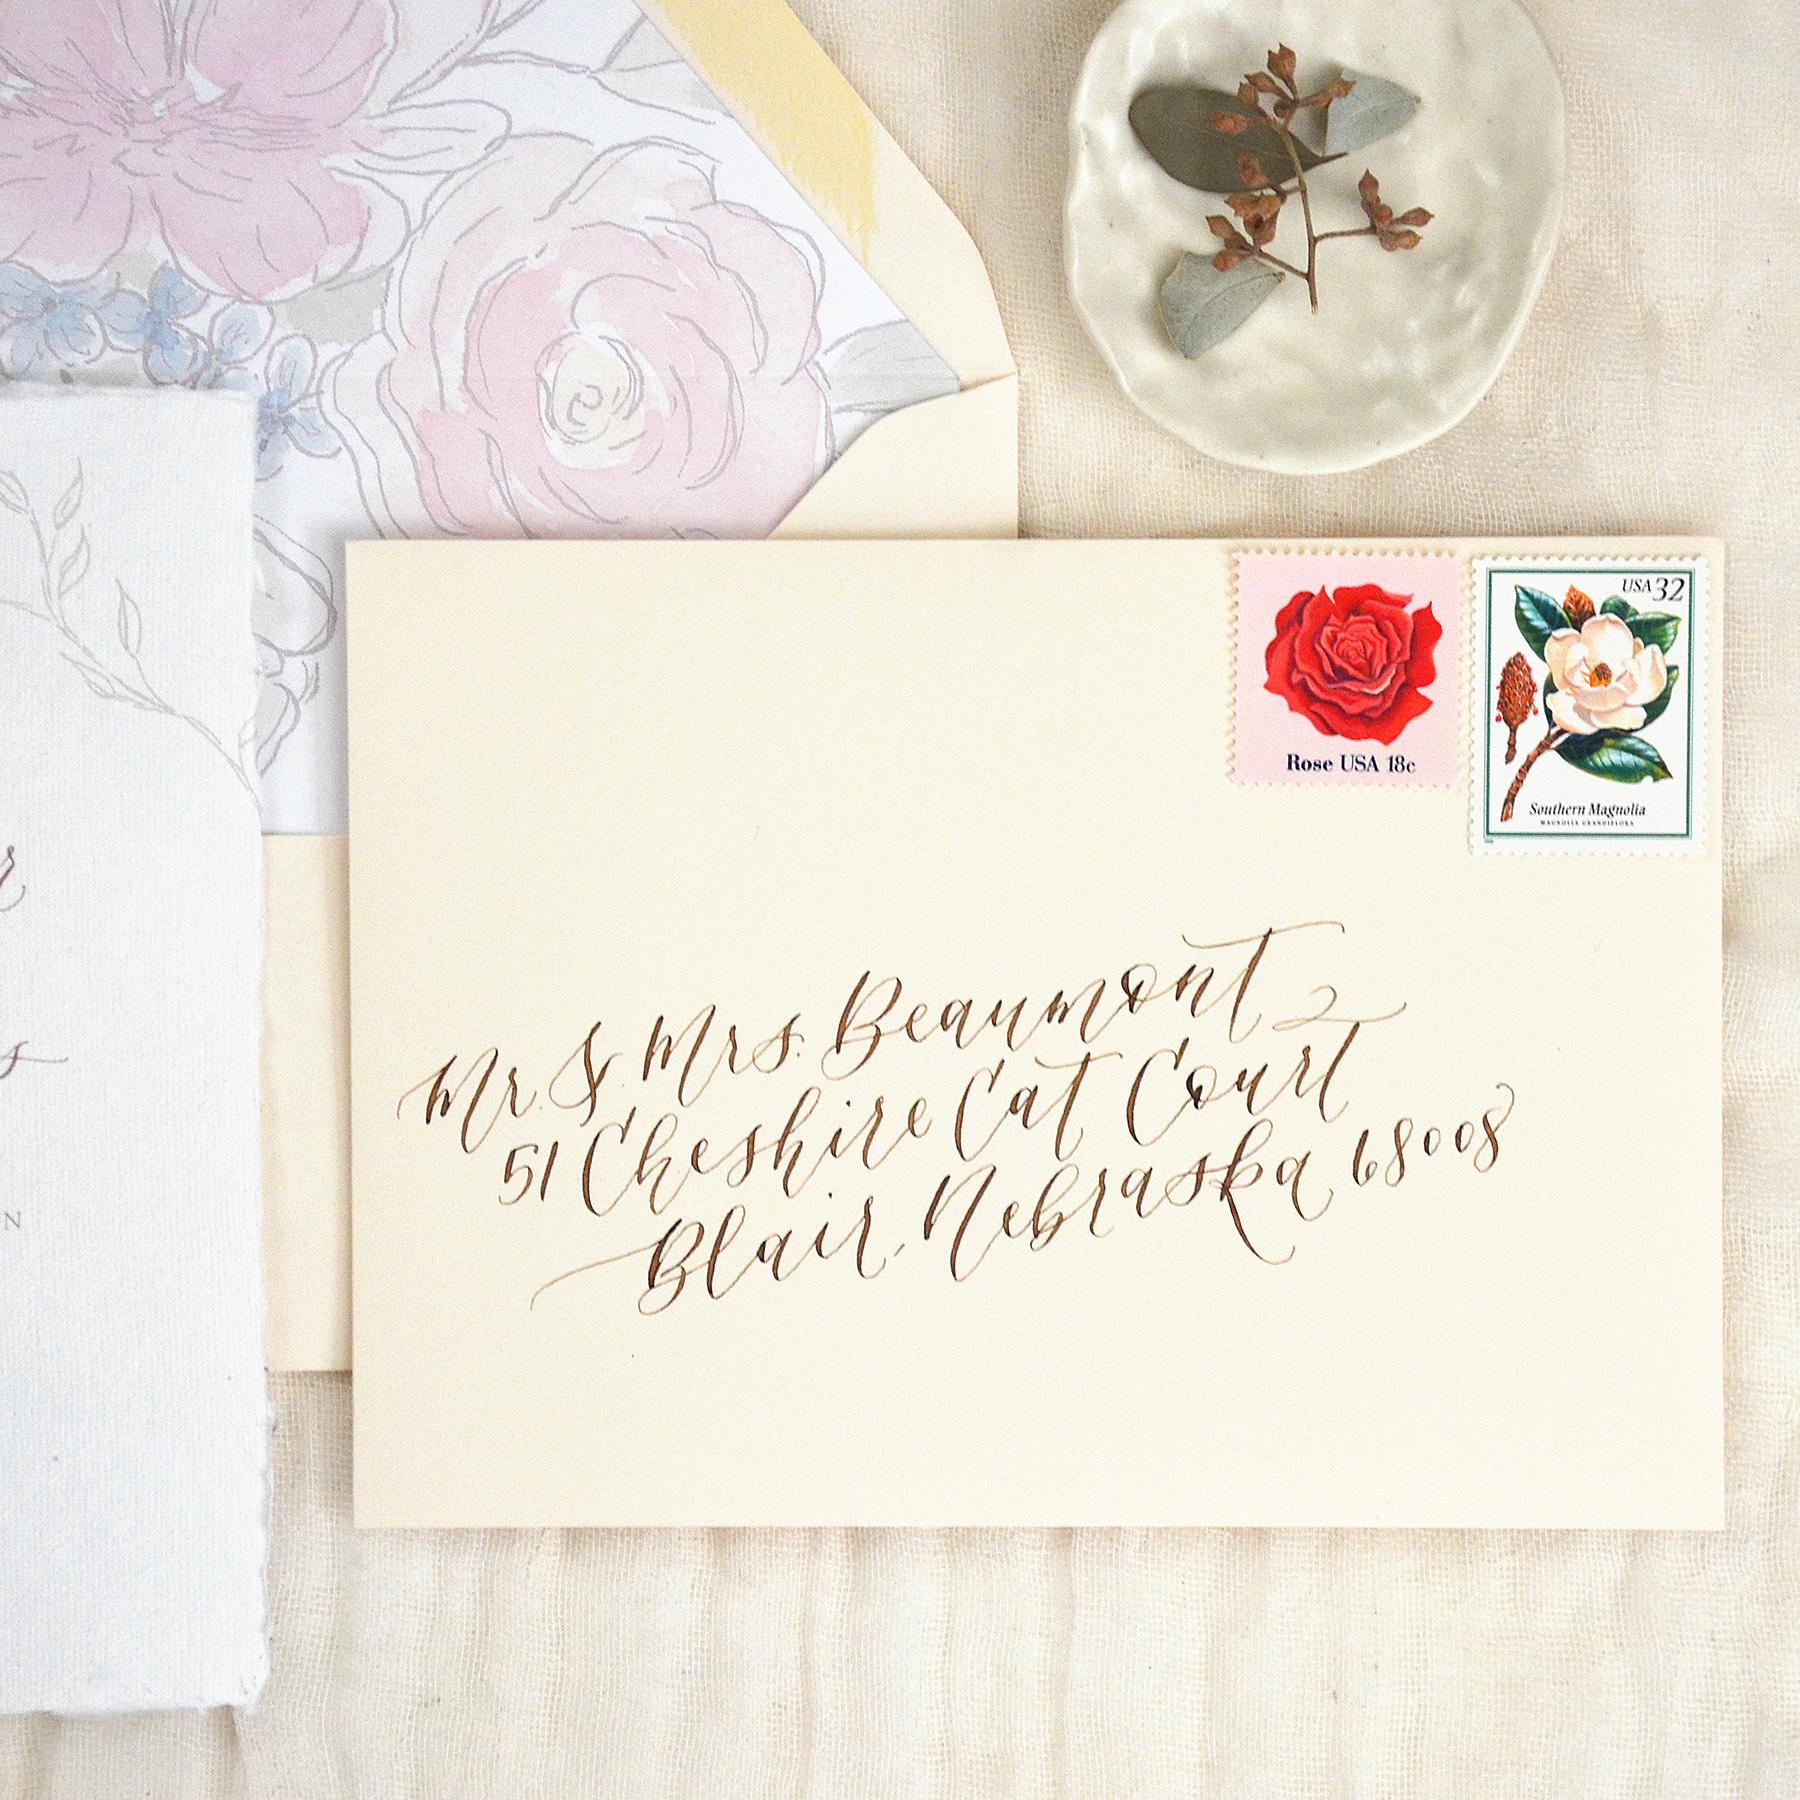 Blush Wedding Invitation Envelope with Pointed Pen Calligraphy Addressing by YourNewFriendSam, Etsy